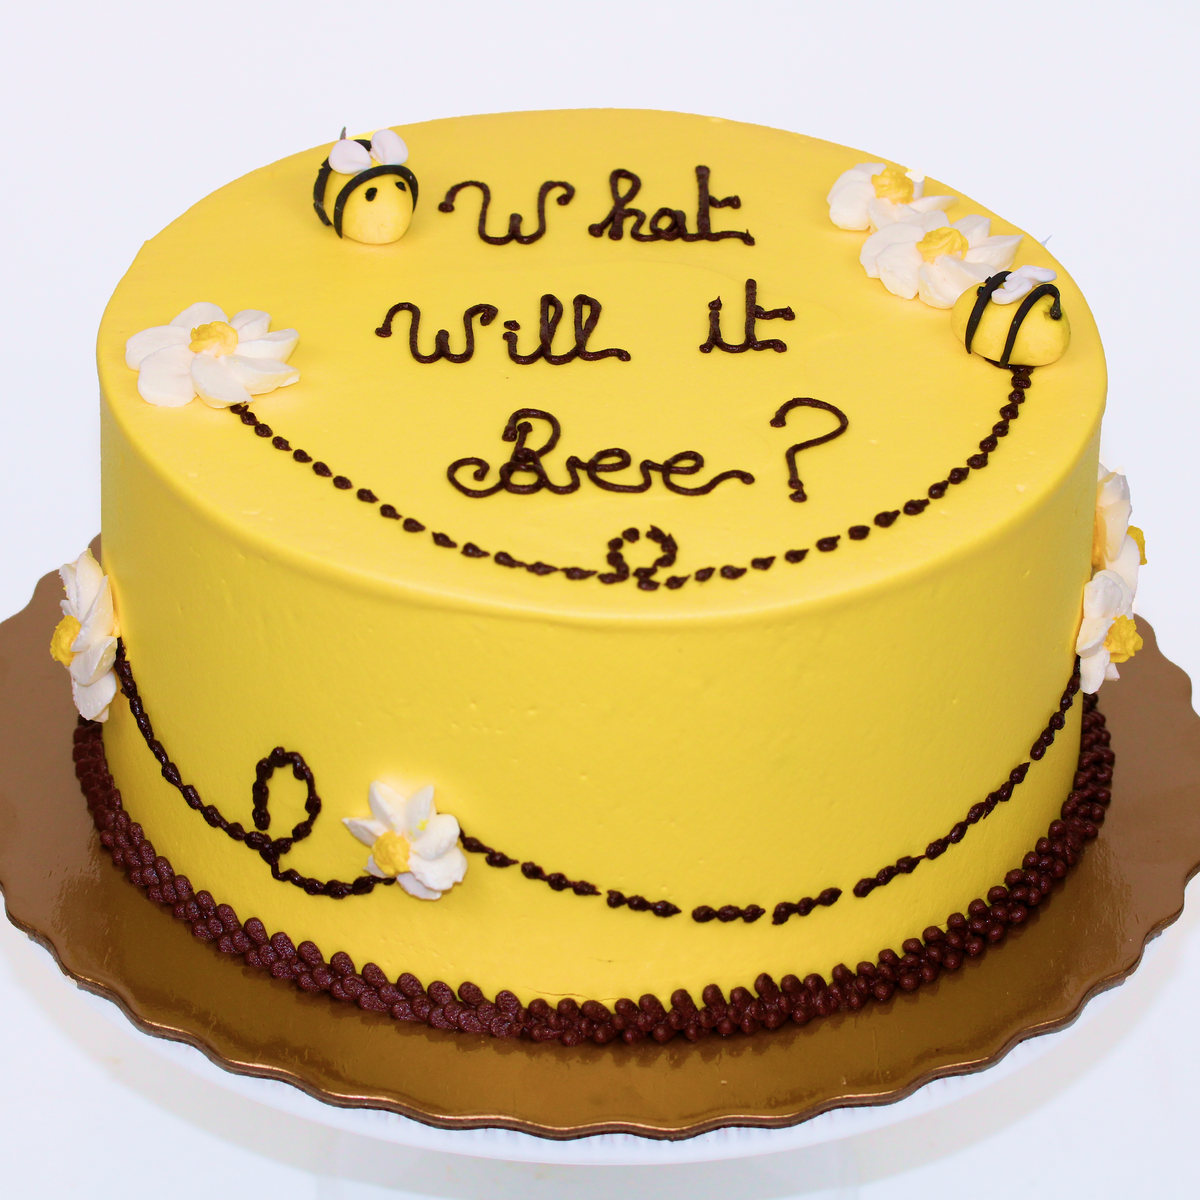 Peachy By The Way Bakery Funny Birthday Cards Online Sheoxdamsfinfo